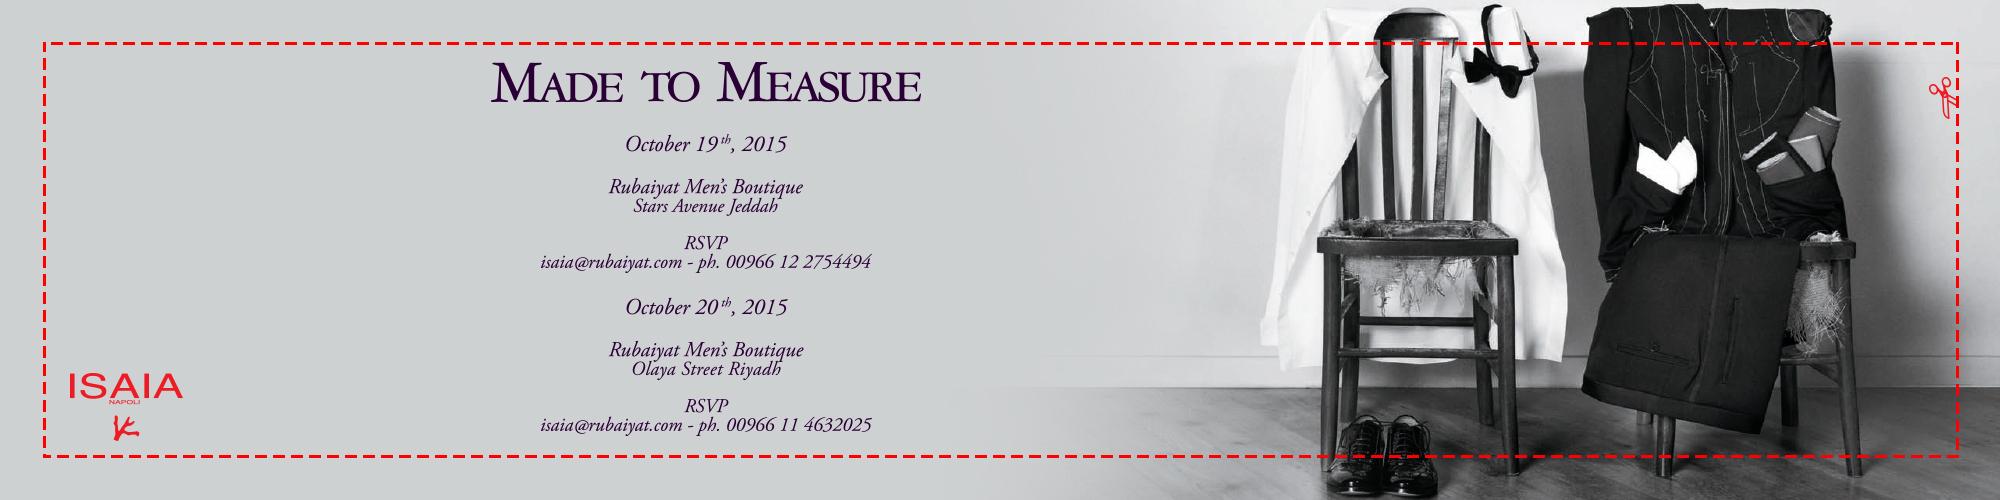 ISAIA-MTM-web-banner